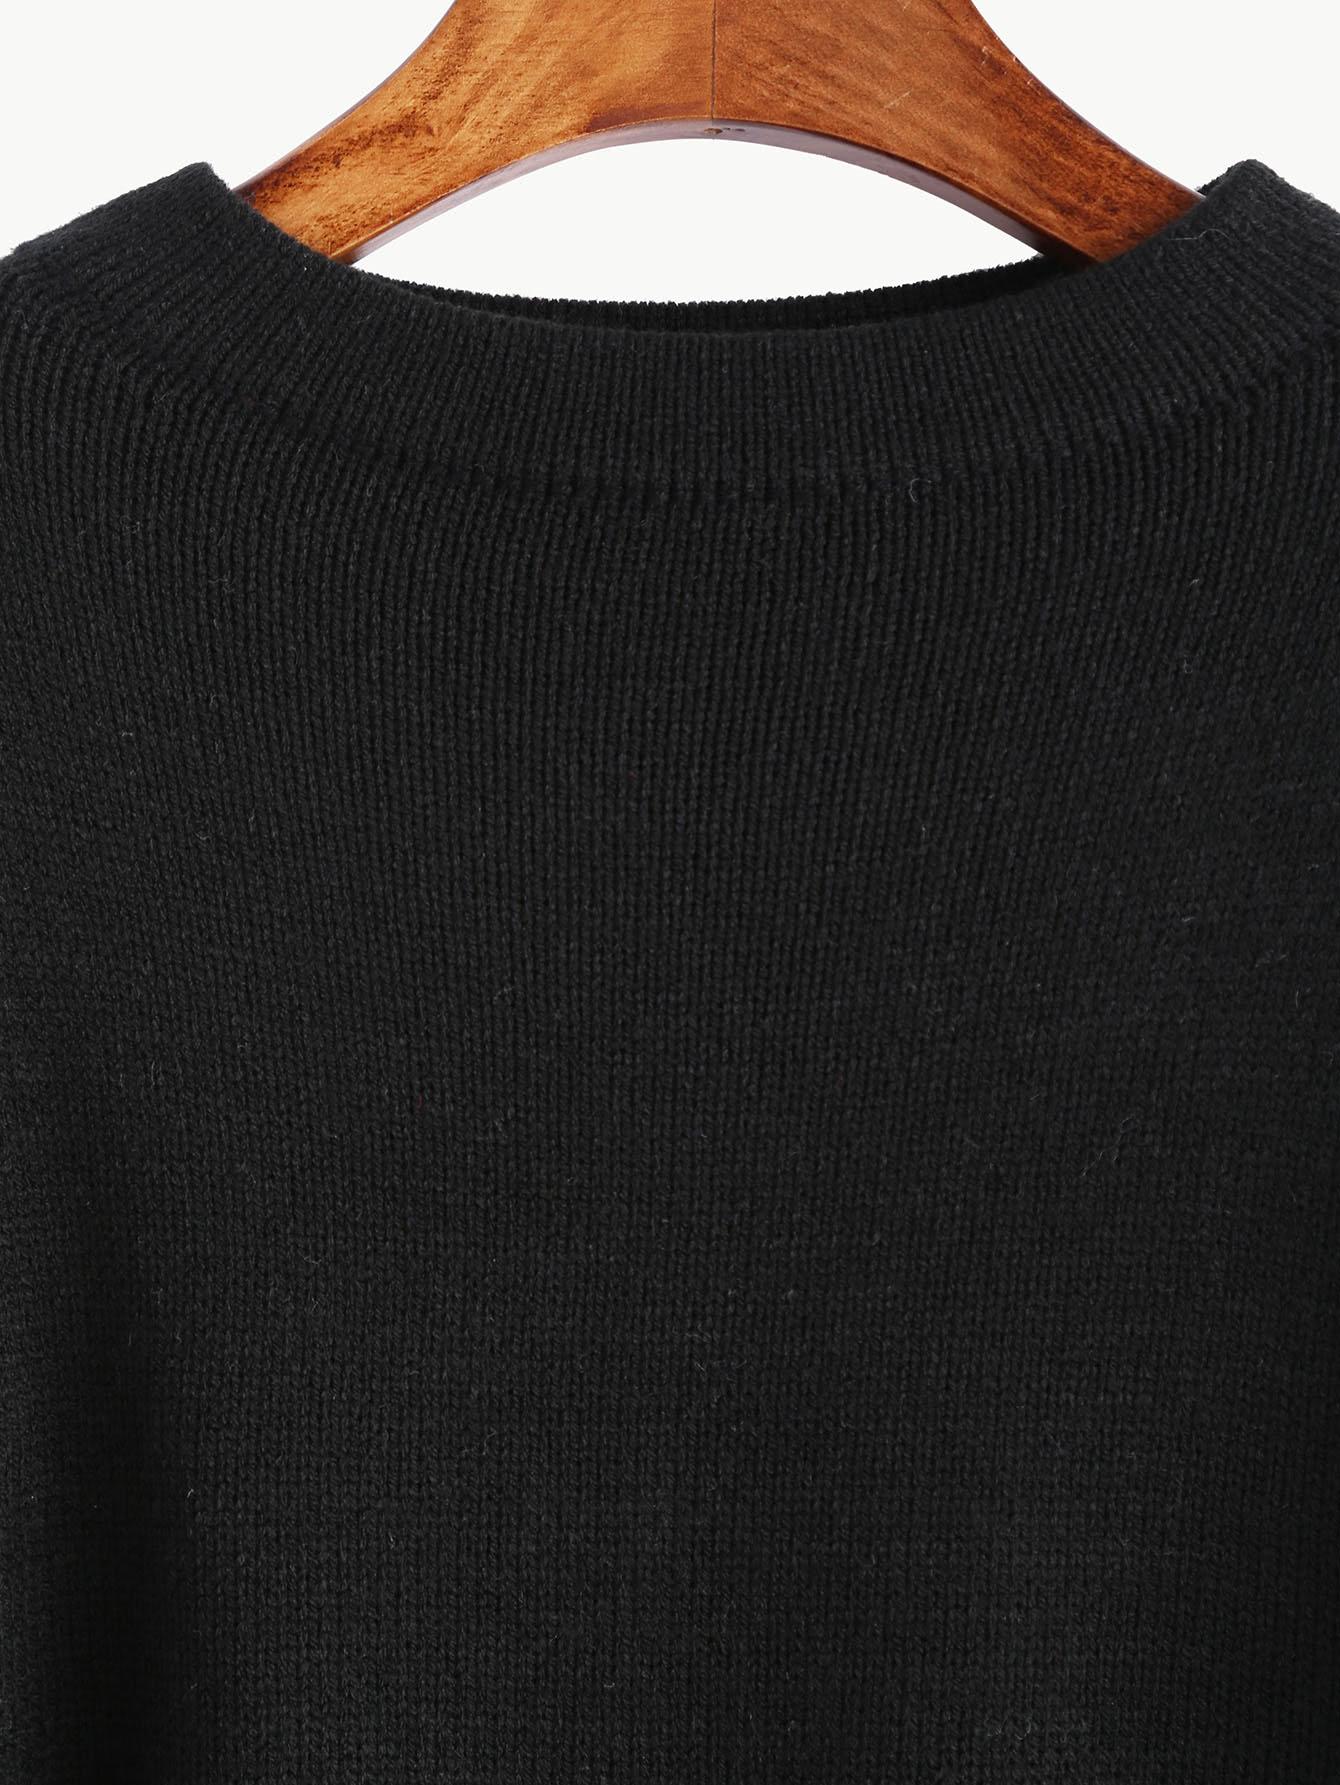 sweater161108450_2